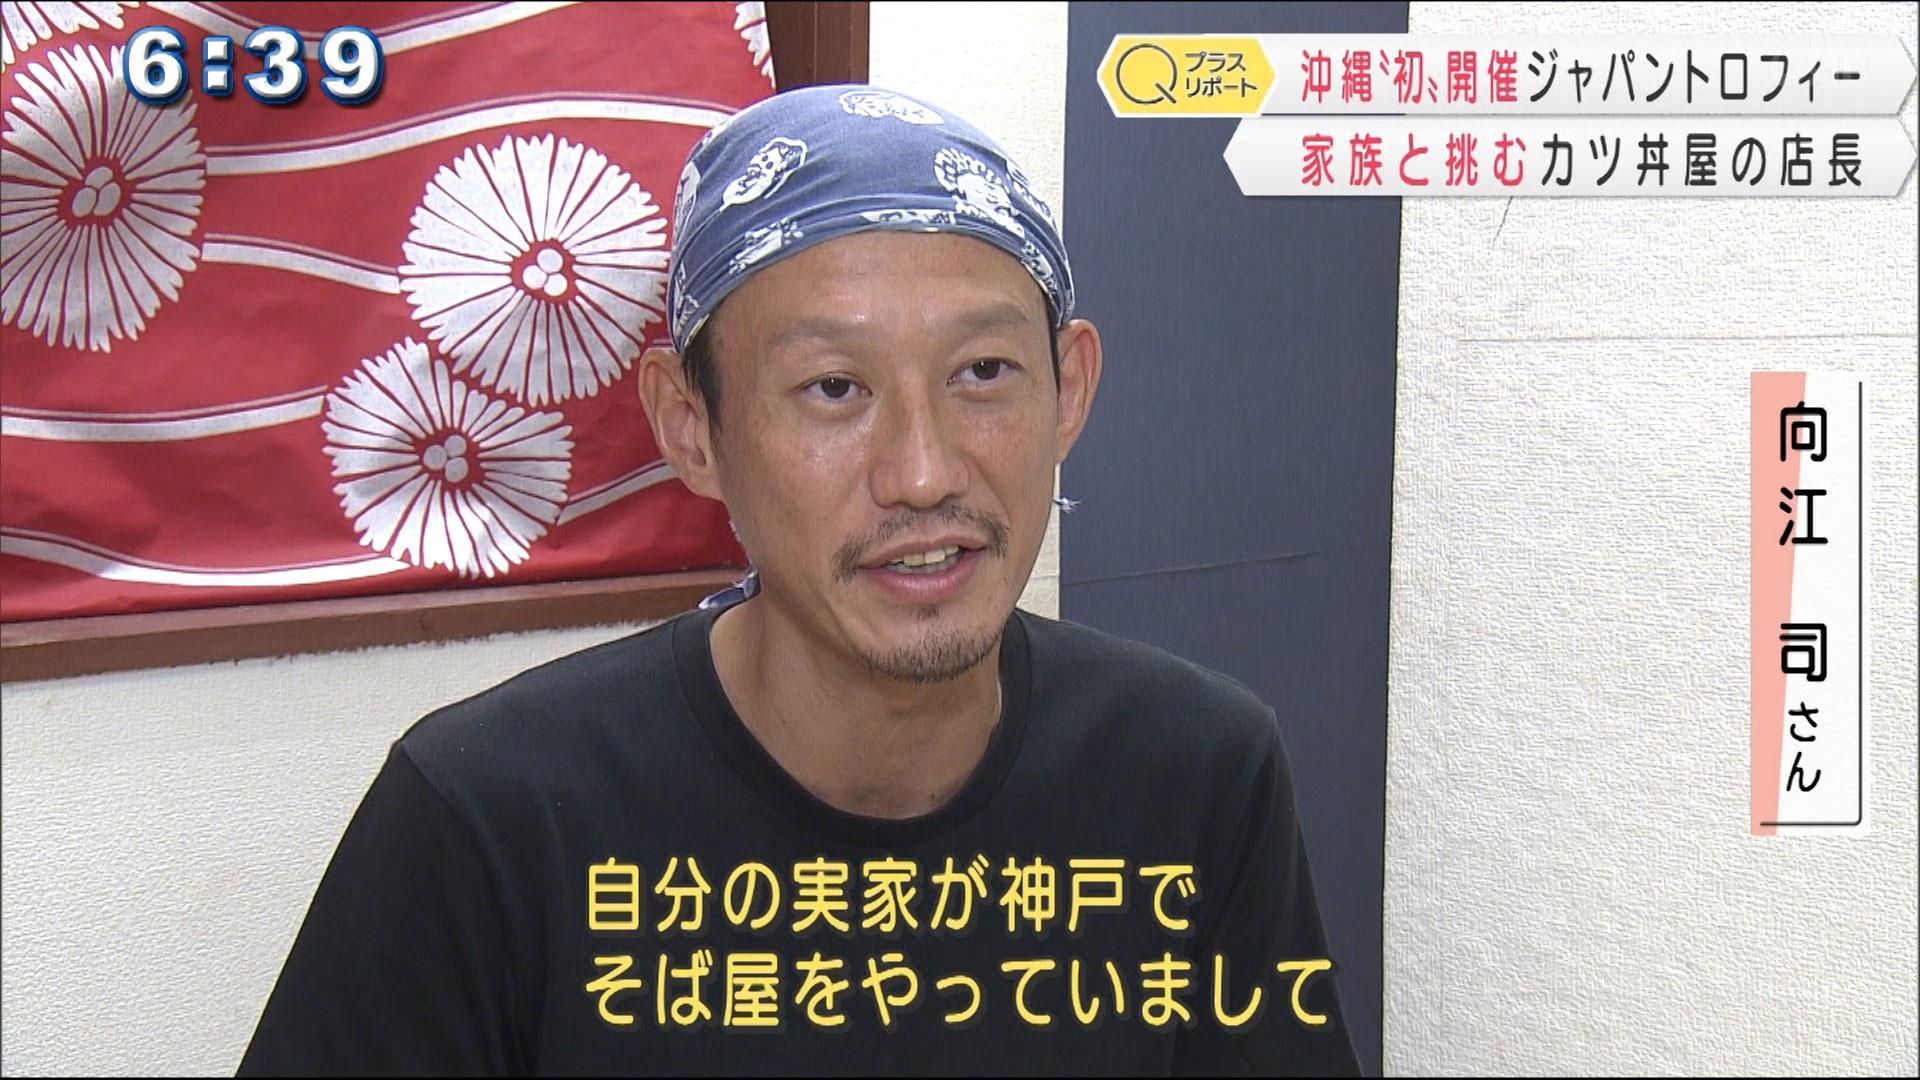 Japan Trophy 200 カツ丼屋店長の200キロ